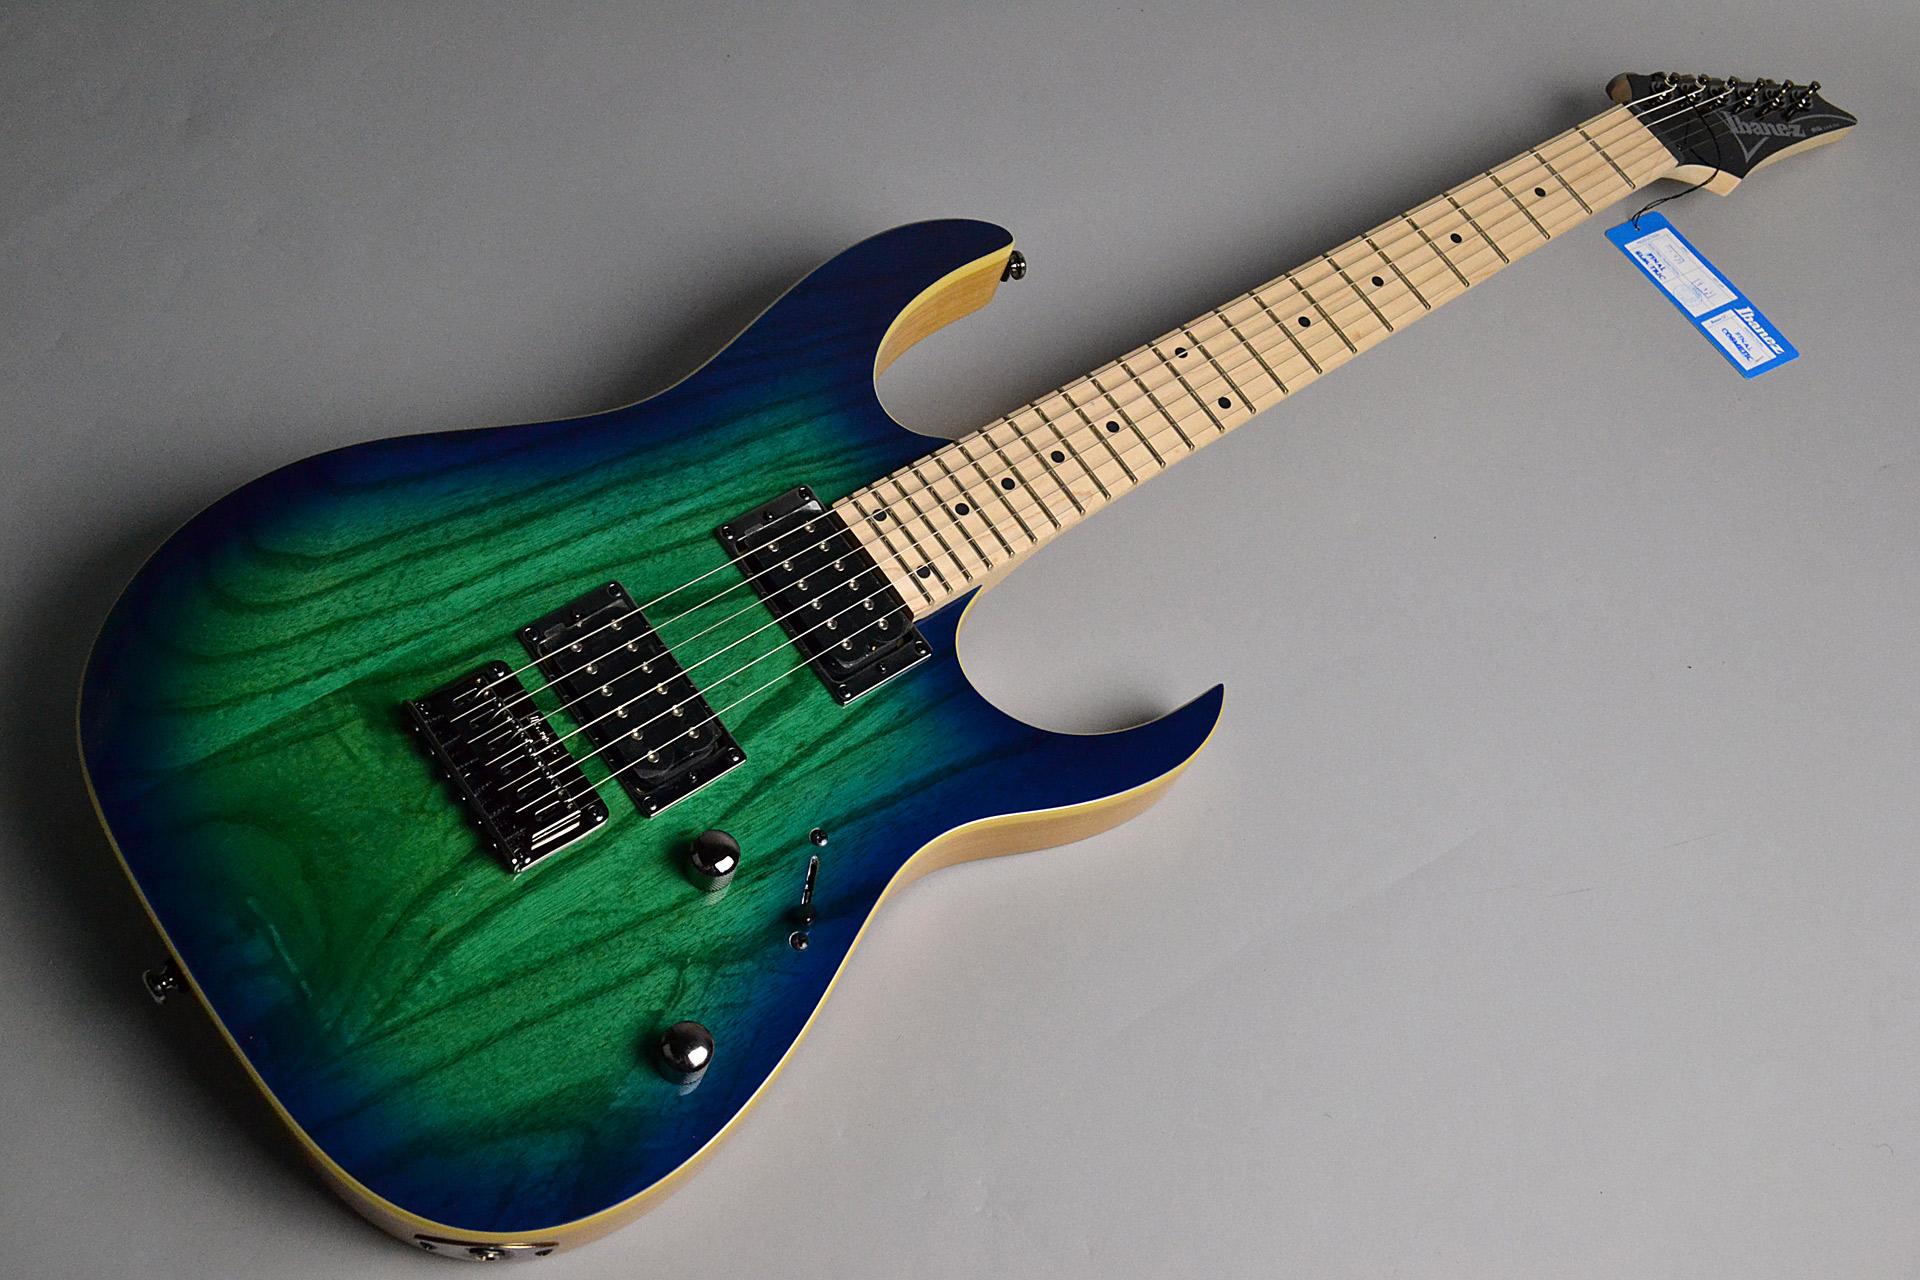 RG421AHM-BMT / BlueMoonBurst / Ash